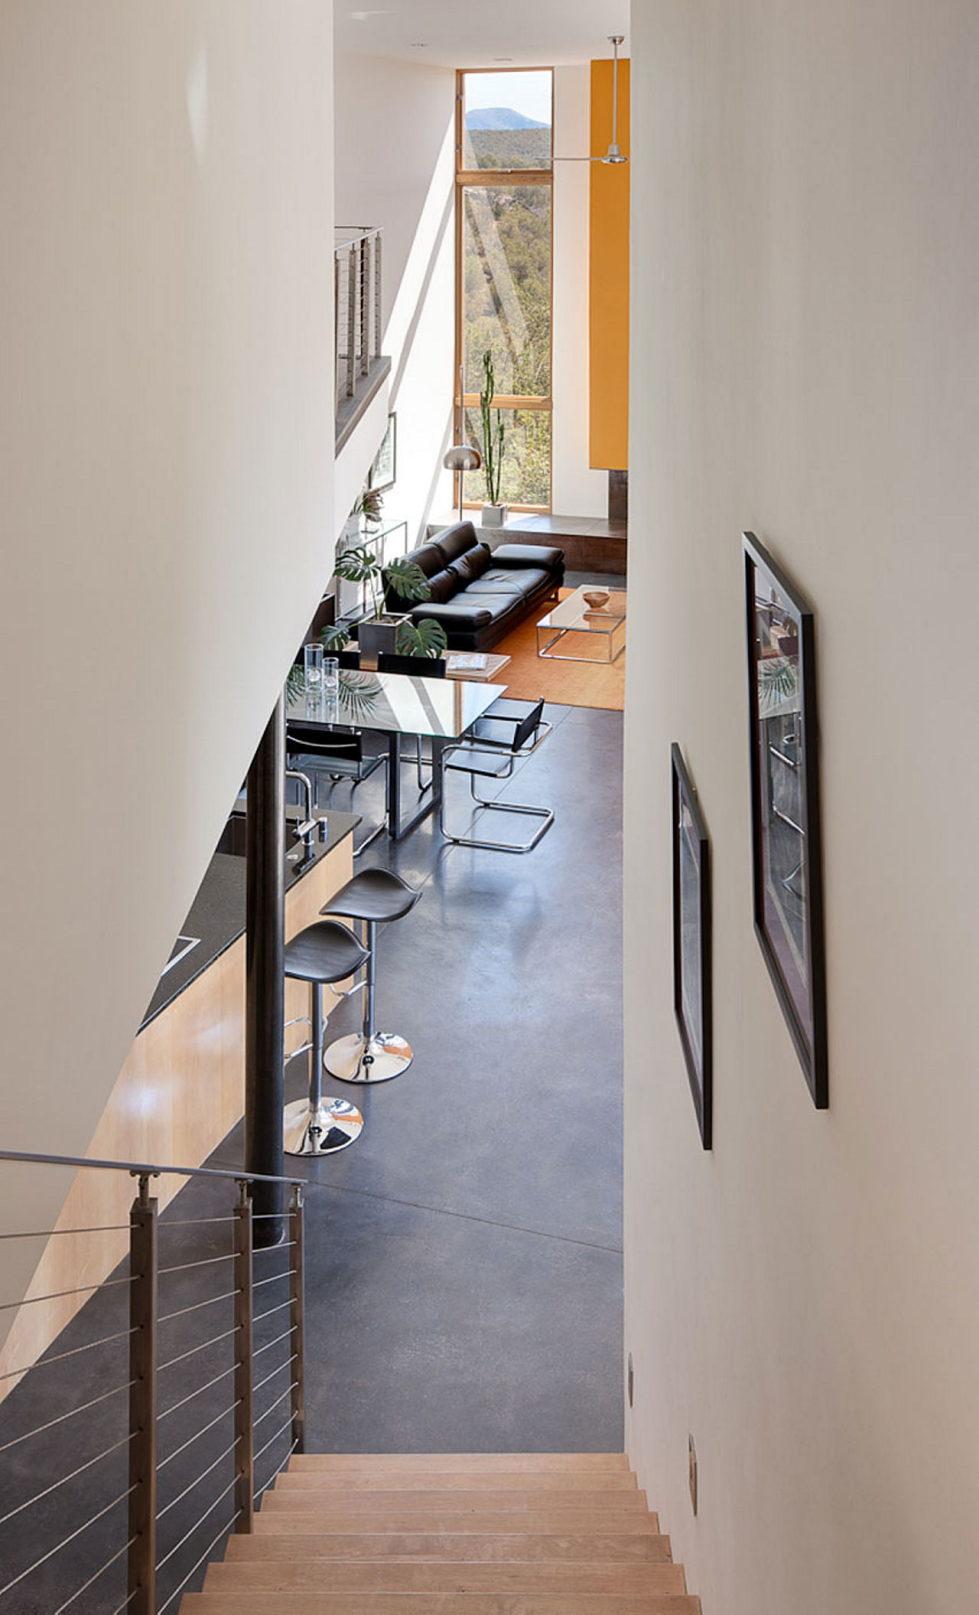 Oblio House Unique Project From Edward Fitzgerald Architects Studio 6